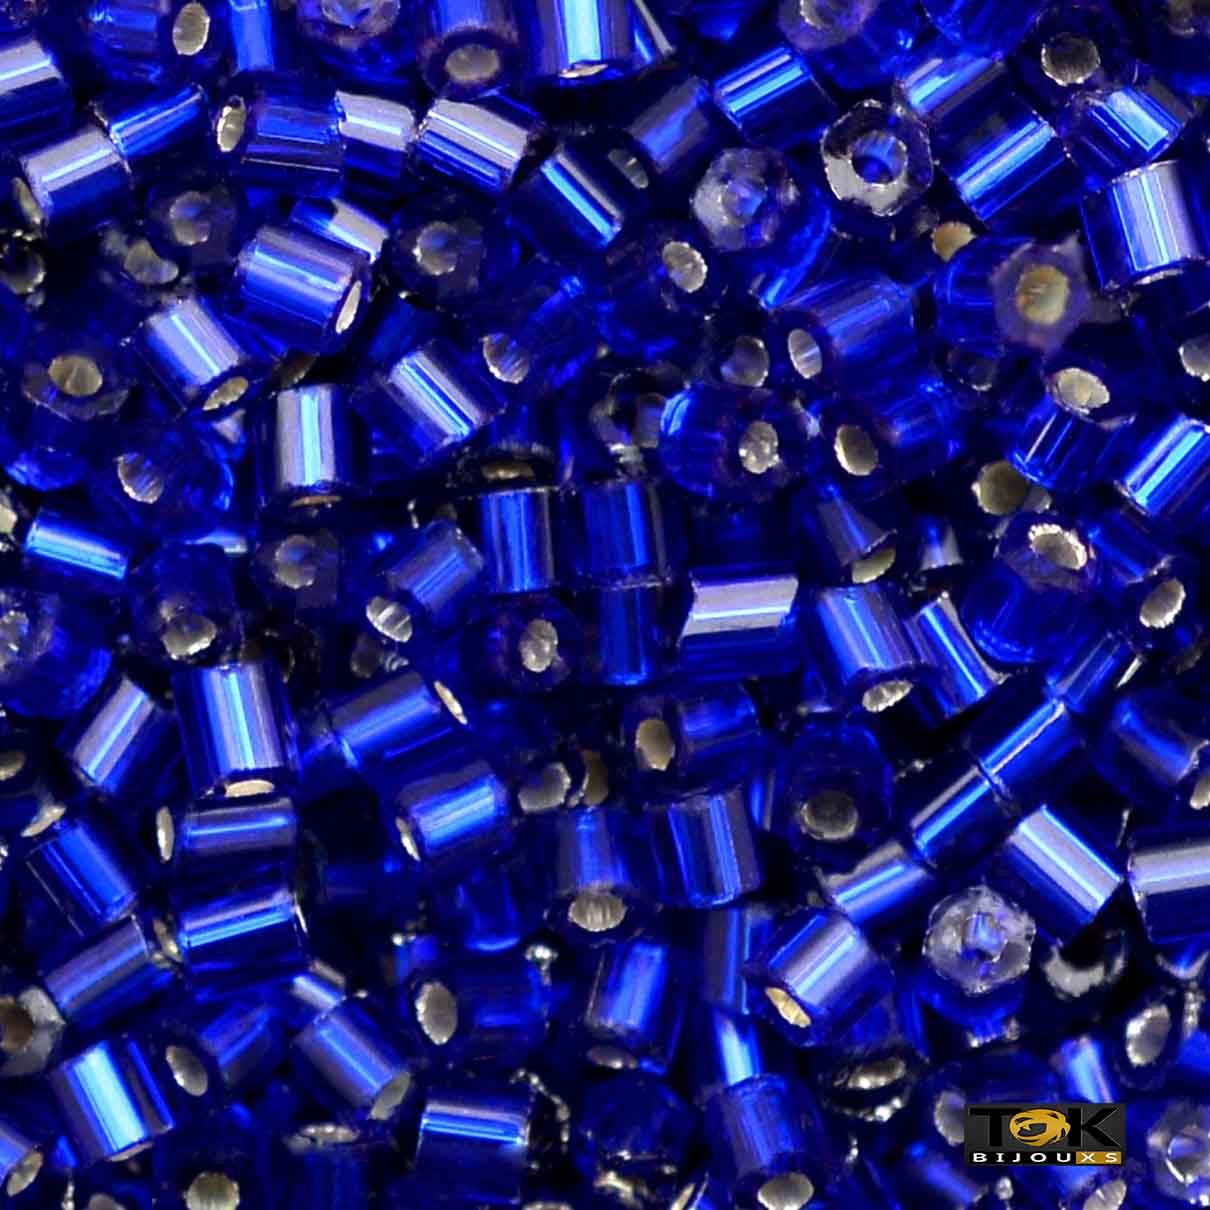 Vidrilho Jablonex - Azul Royal Esc Transp Ref 37100  - 500g